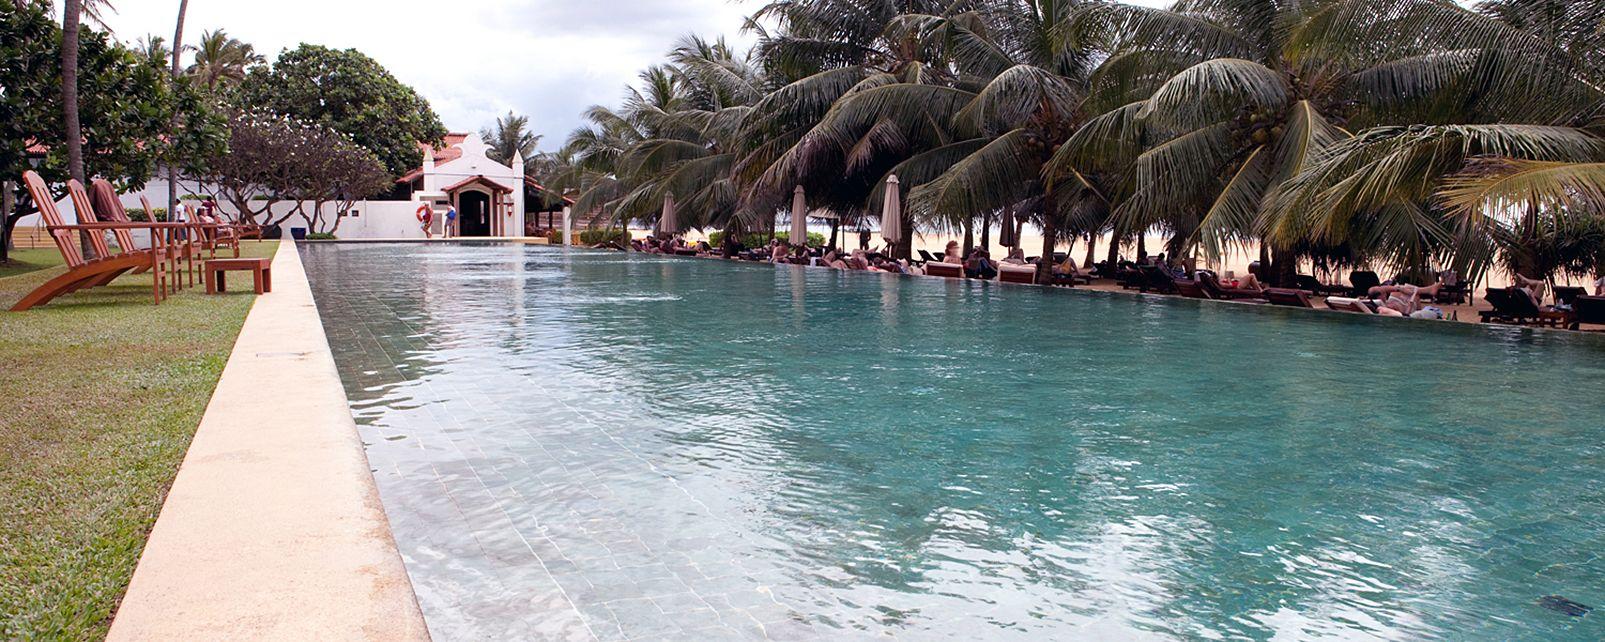 Hotel Jetwing Beach Hotel